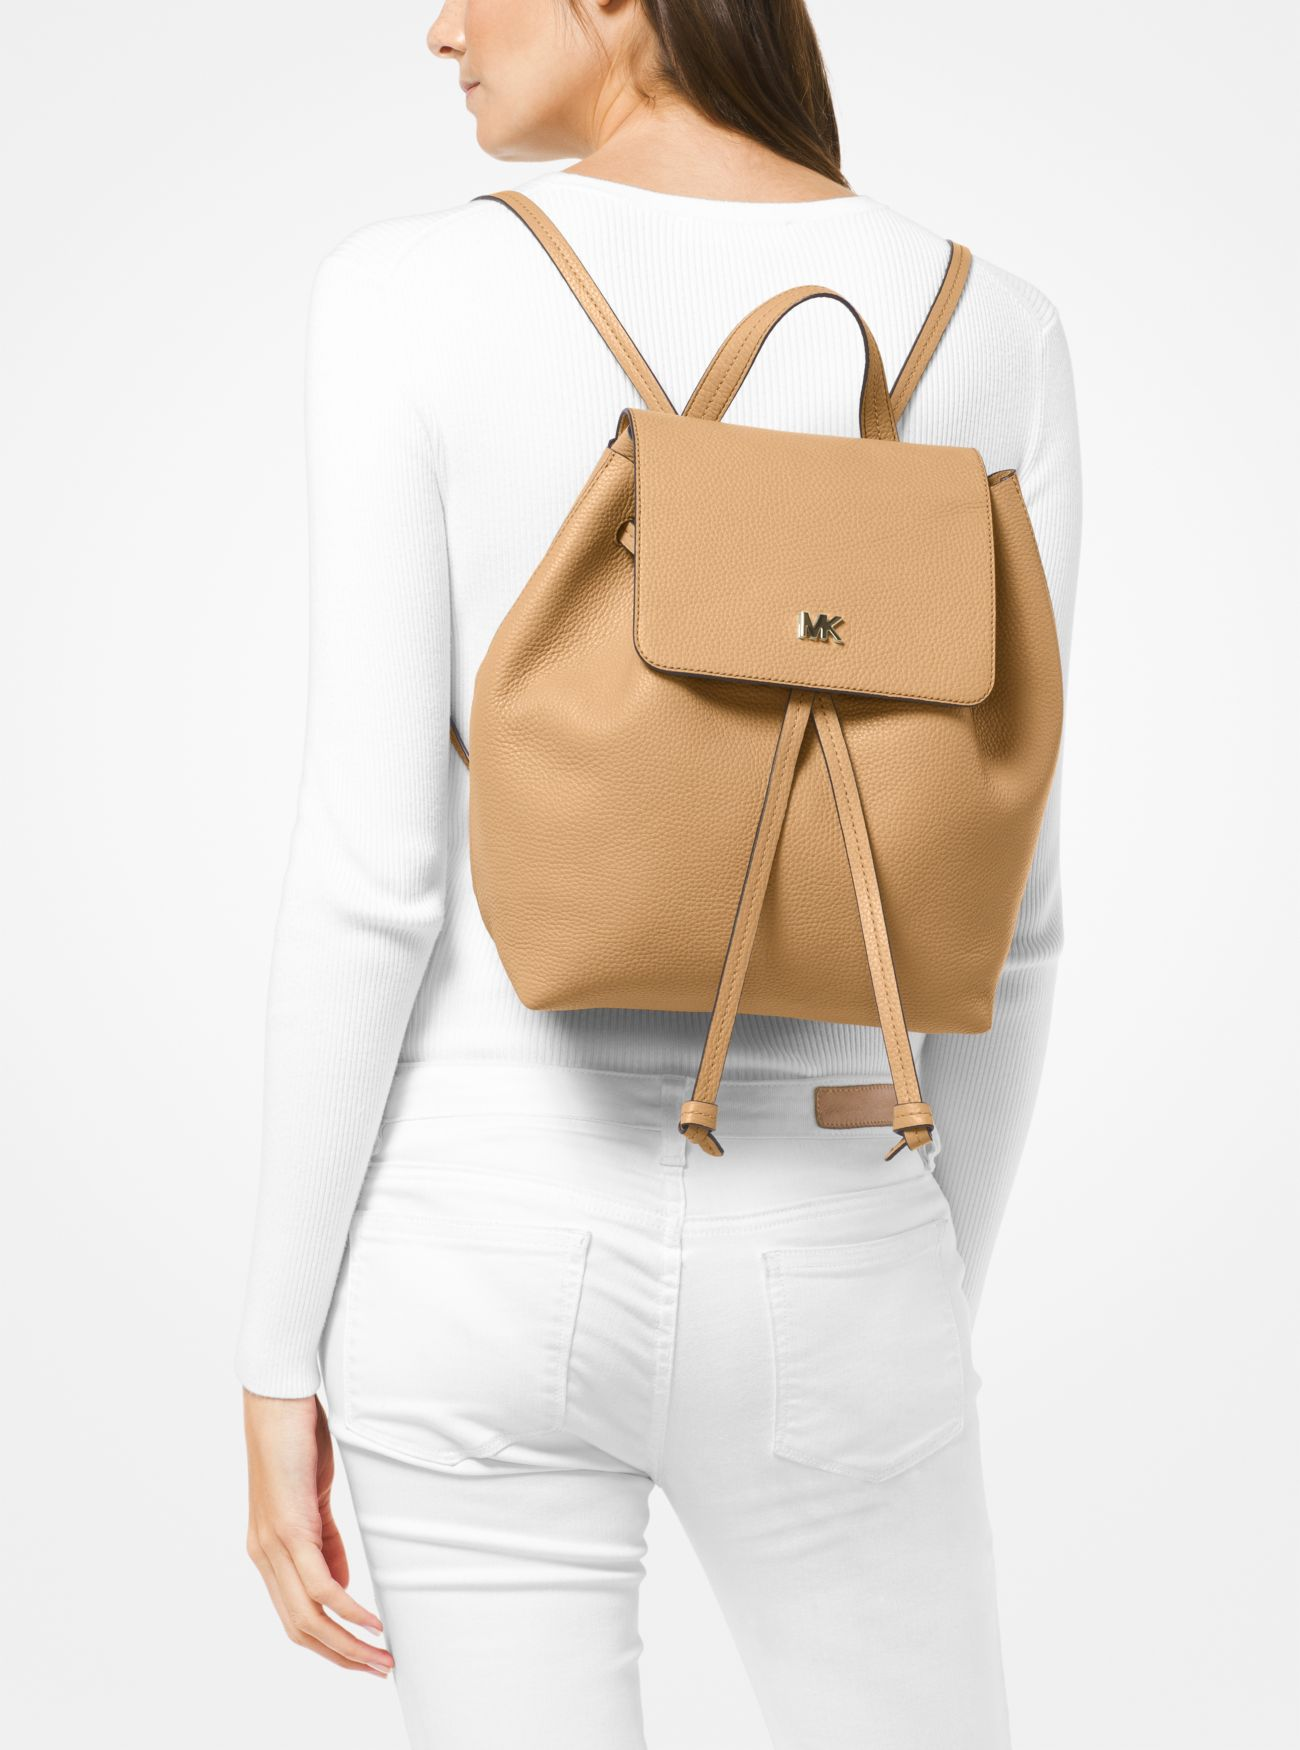 018eee072f8f ... Junie Medium Pebbled Leather Backpack. MICHAEL Michael Kors